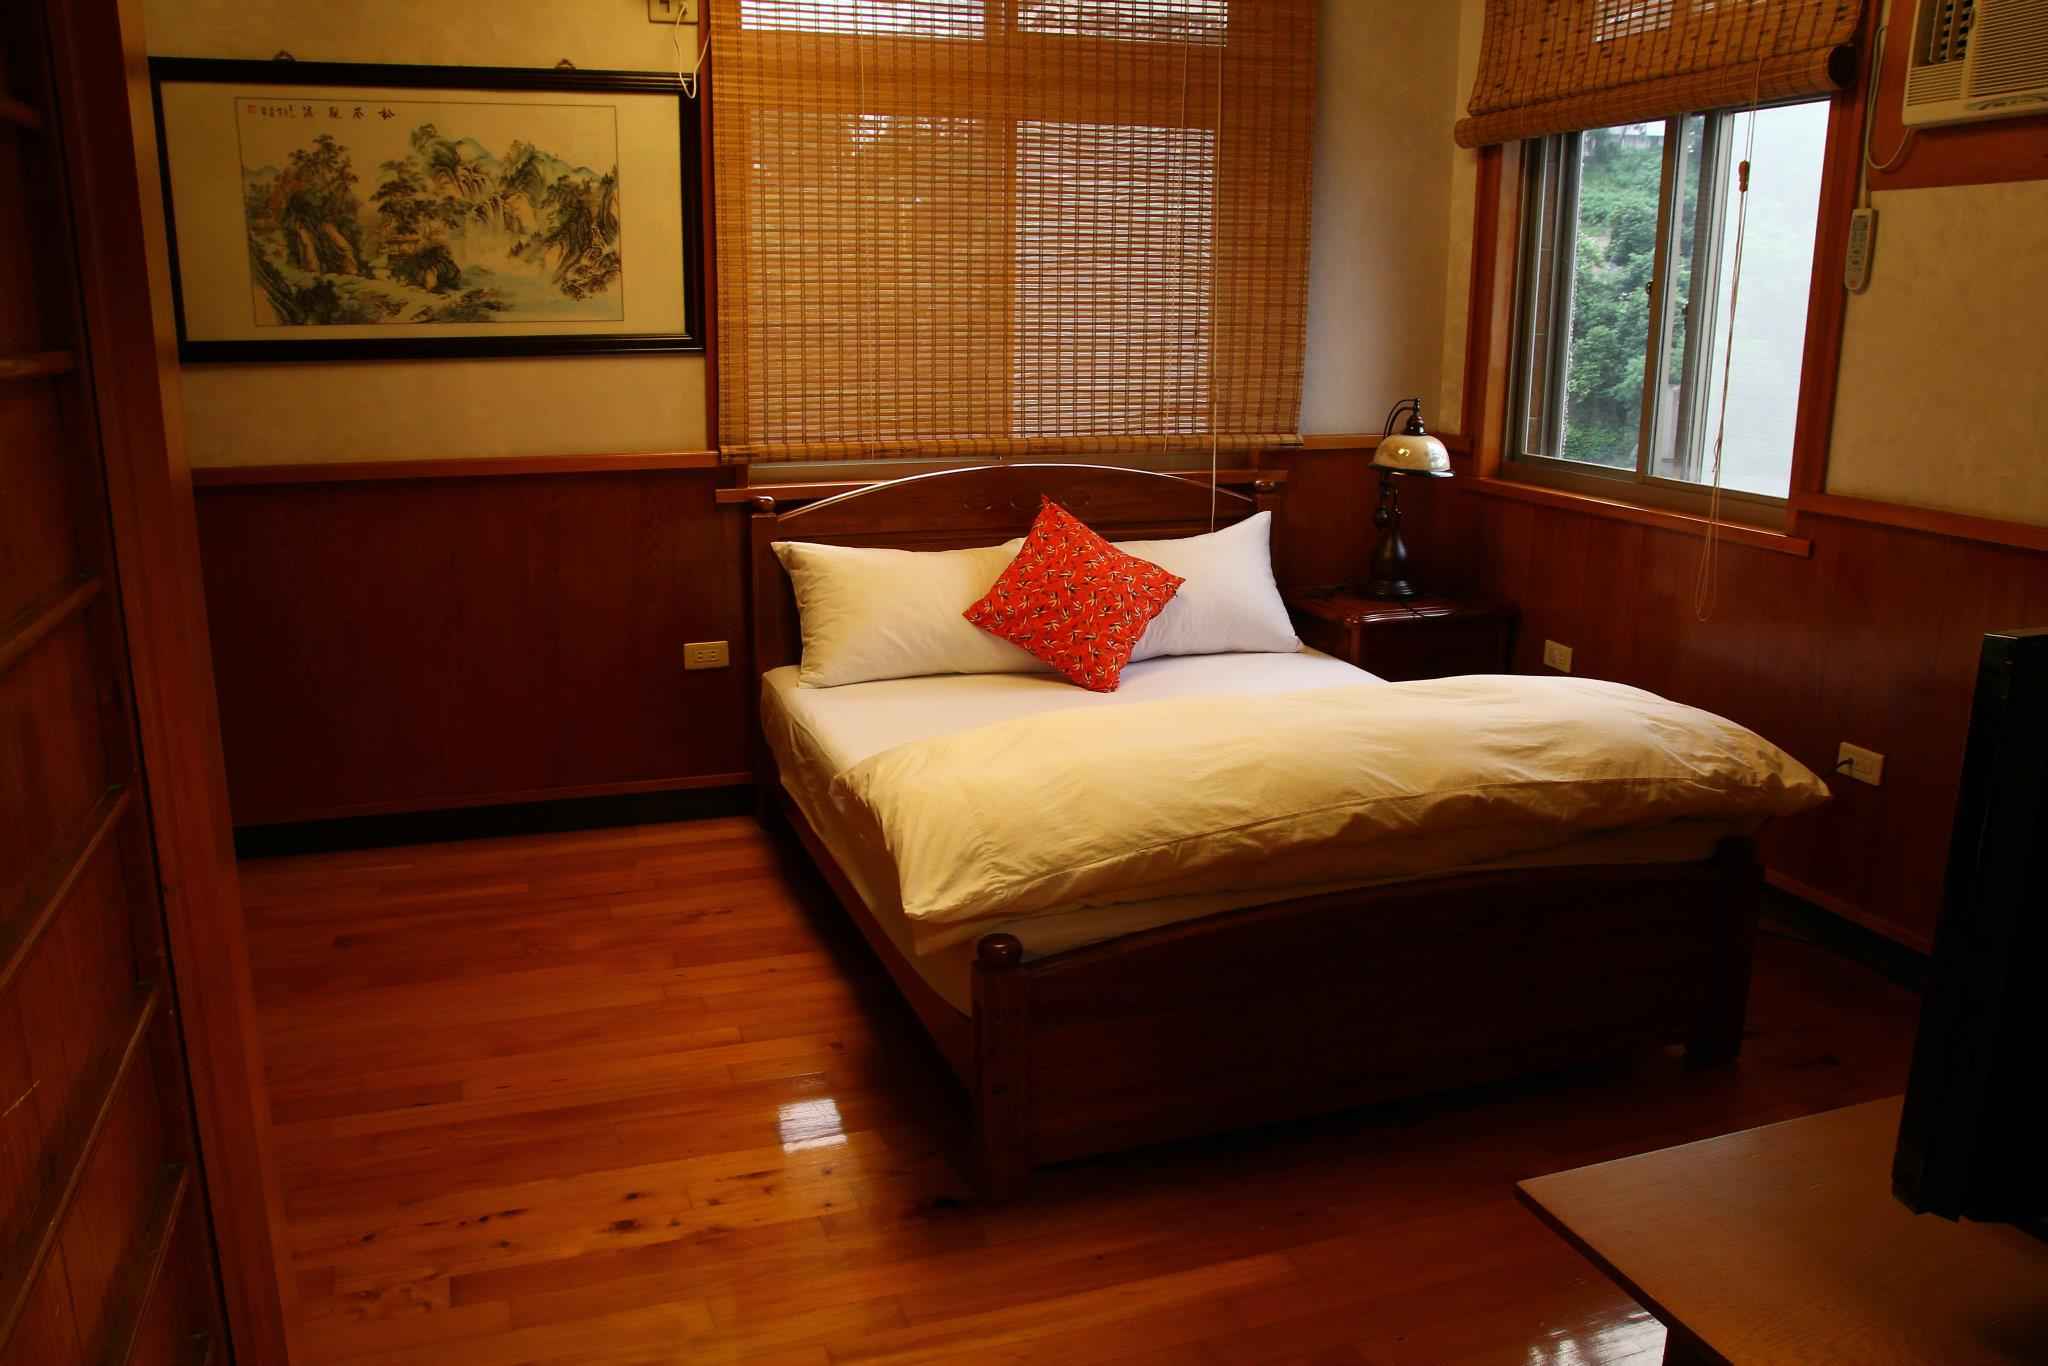 Jinghua House